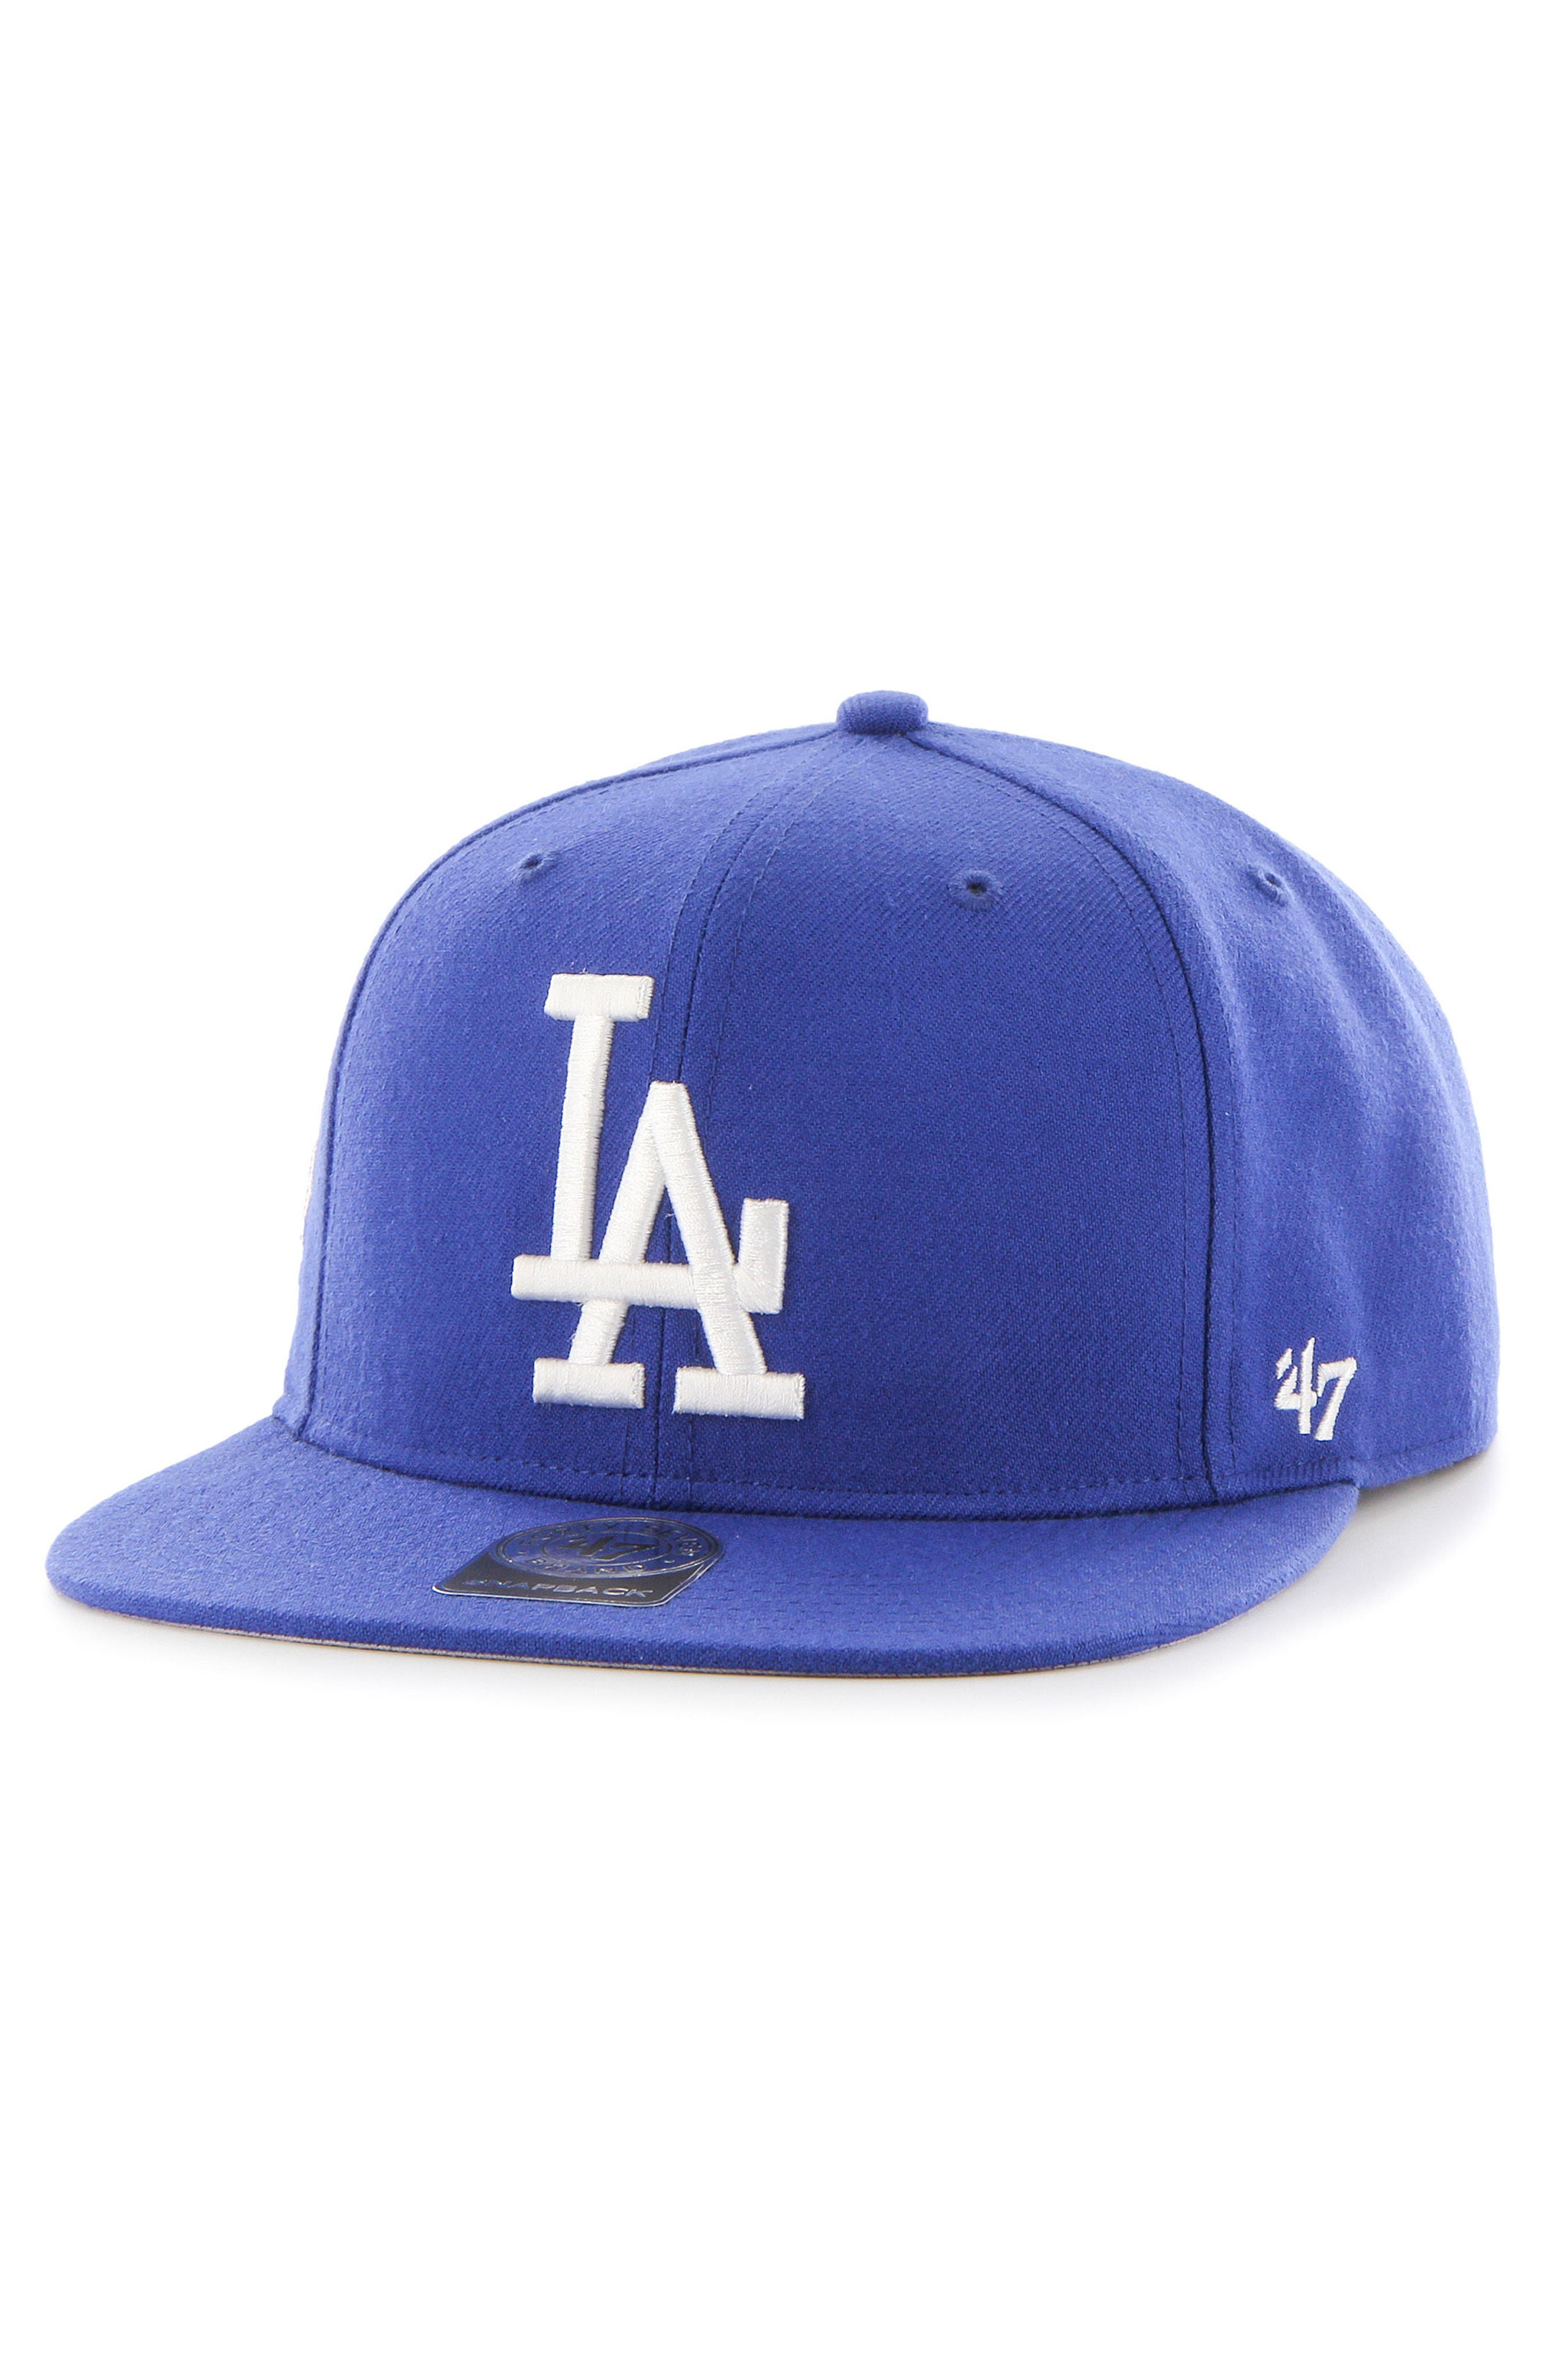 Alternate Image 1 Selected - 47 Brand LA Dodgers Sure Shot Captain Baseball Cap